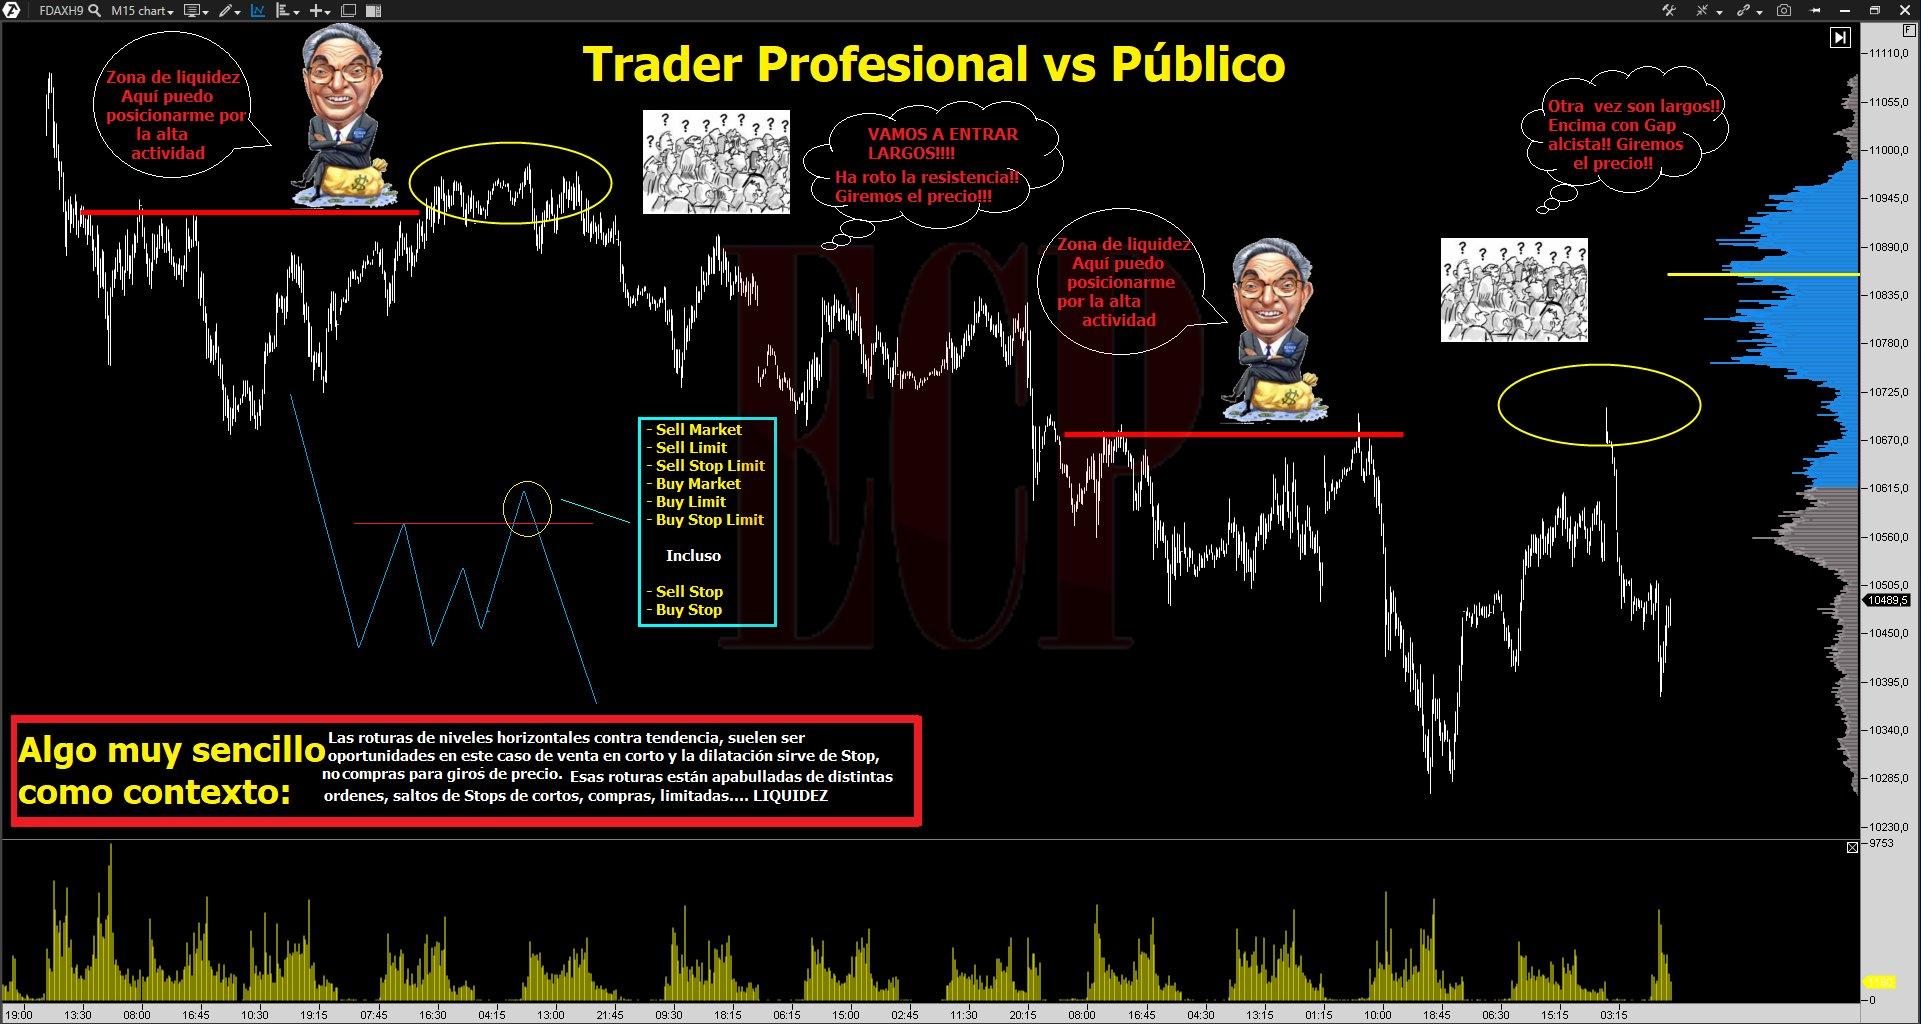 Volume Profile Trading Enric Jaimez 4